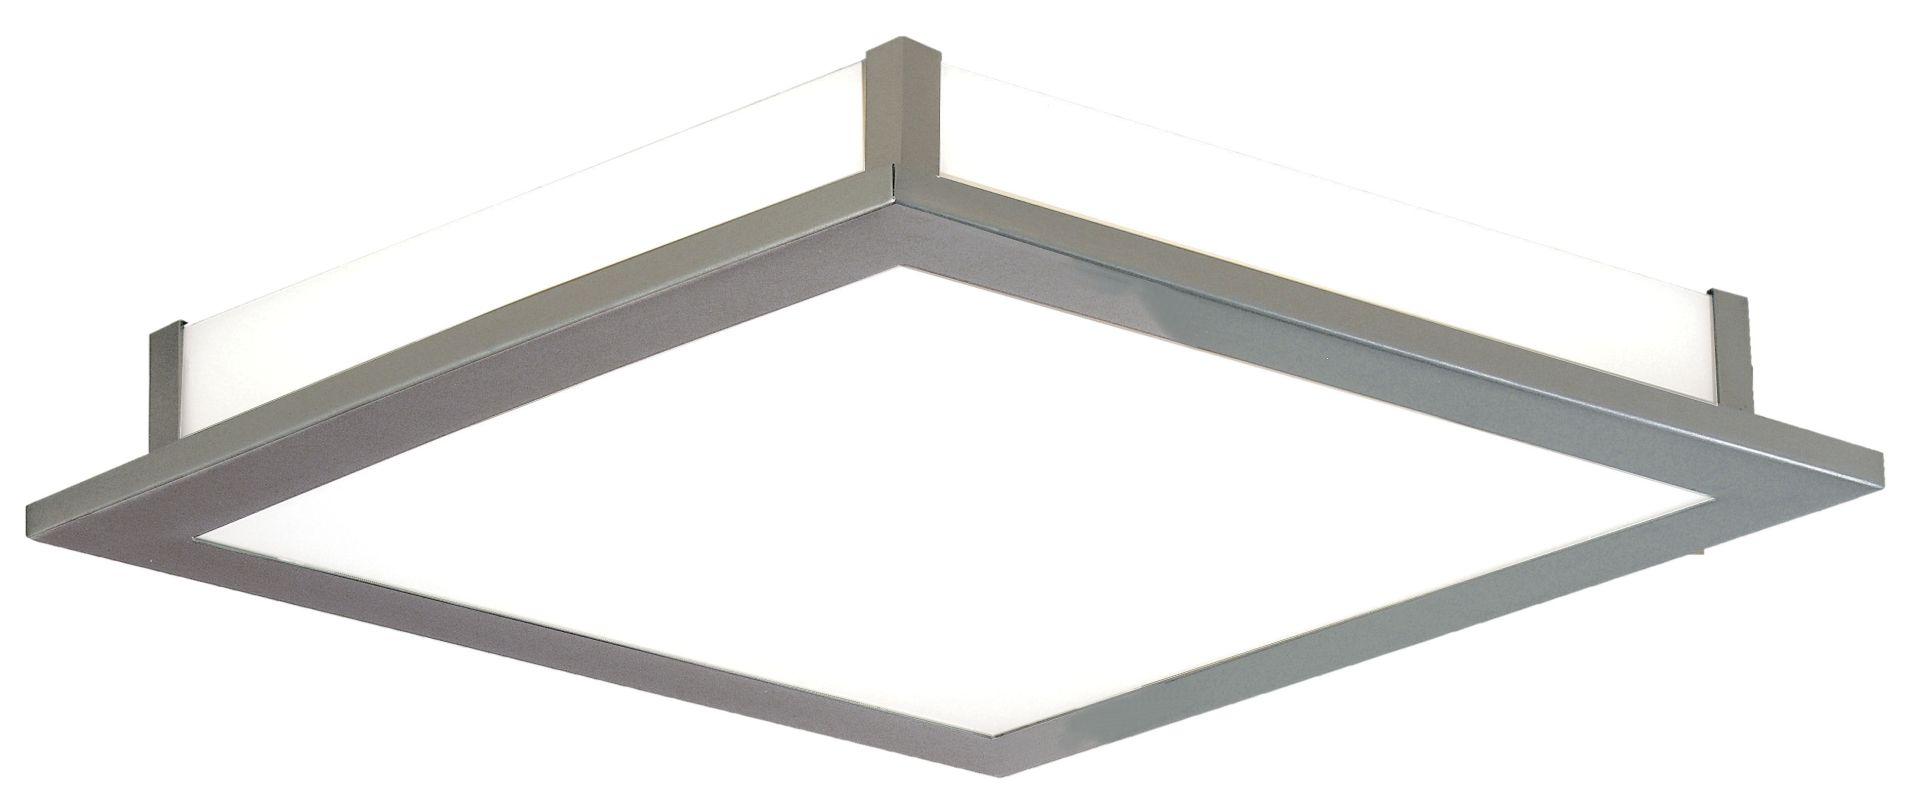 Eglo 88089 Auriga Single-Light Semi-Flush Fixture Matte Nickel Indoor